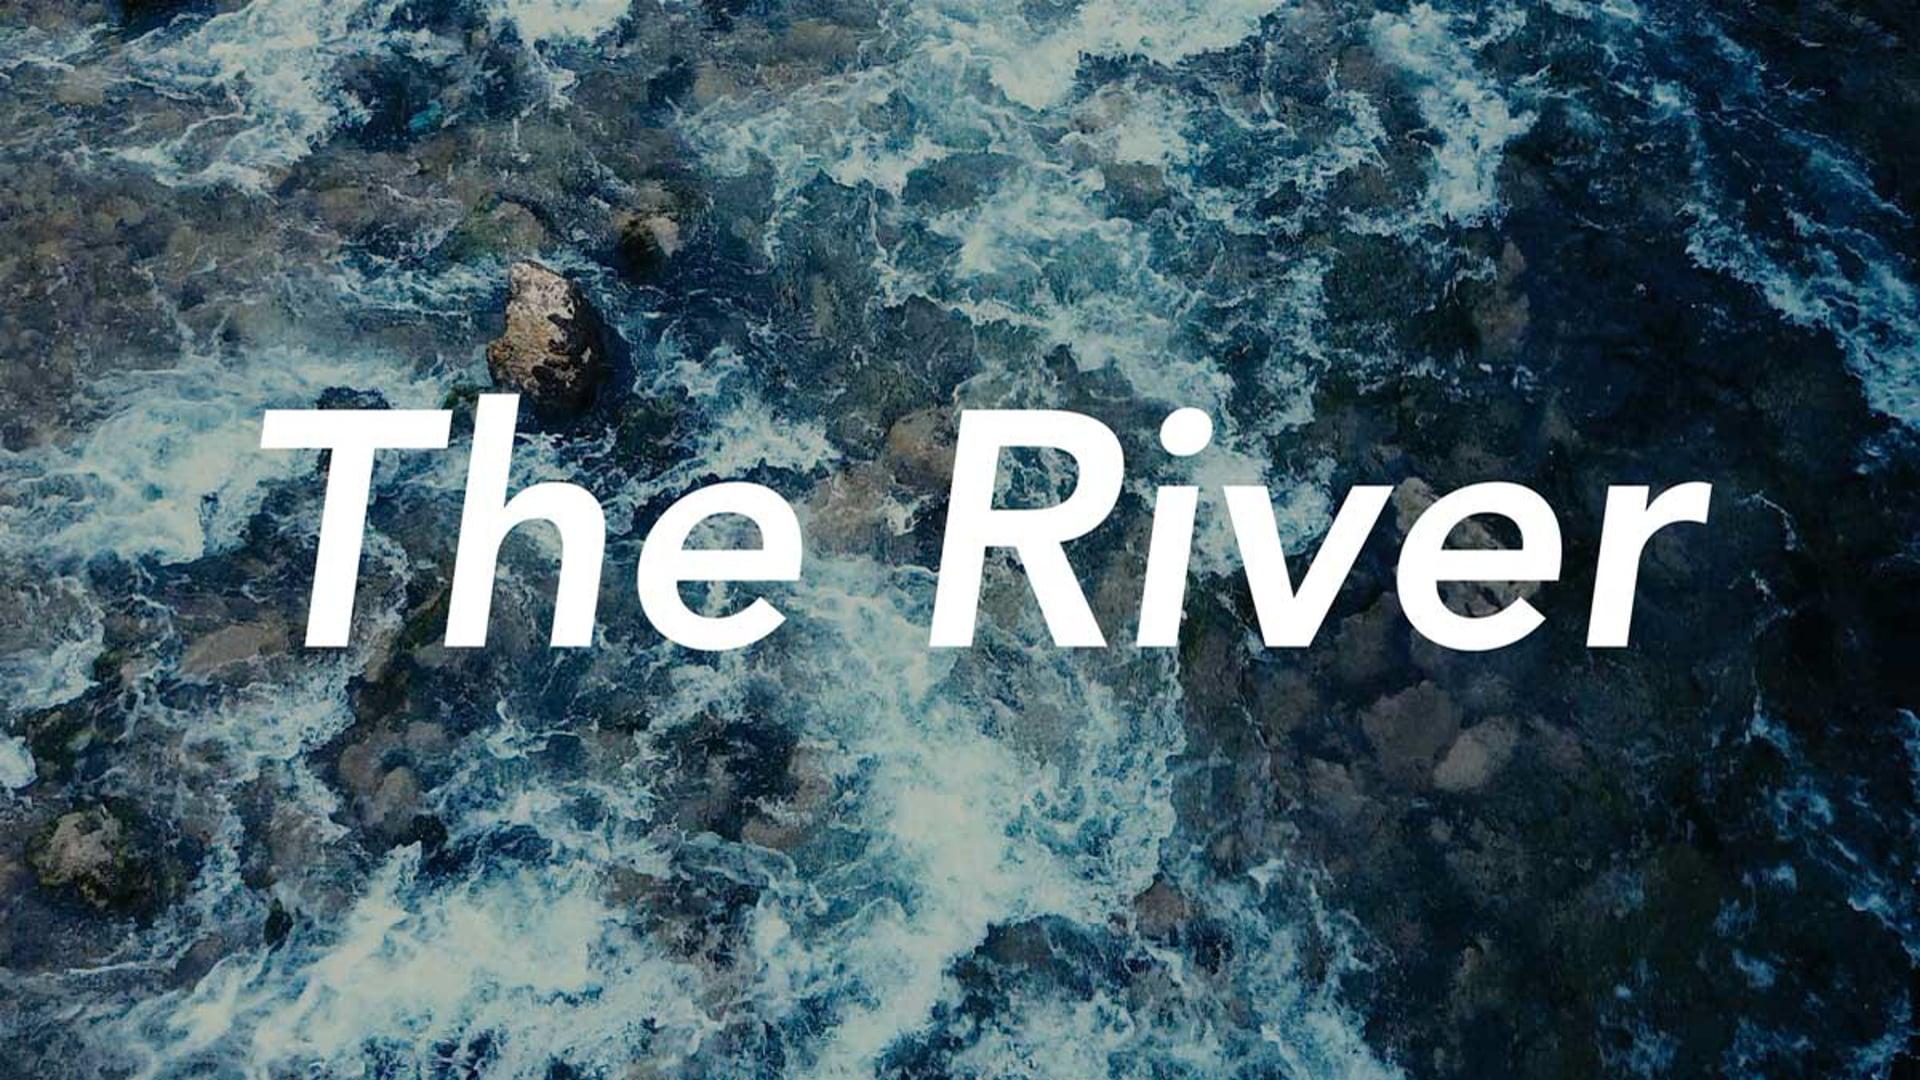 Leadership is like a river